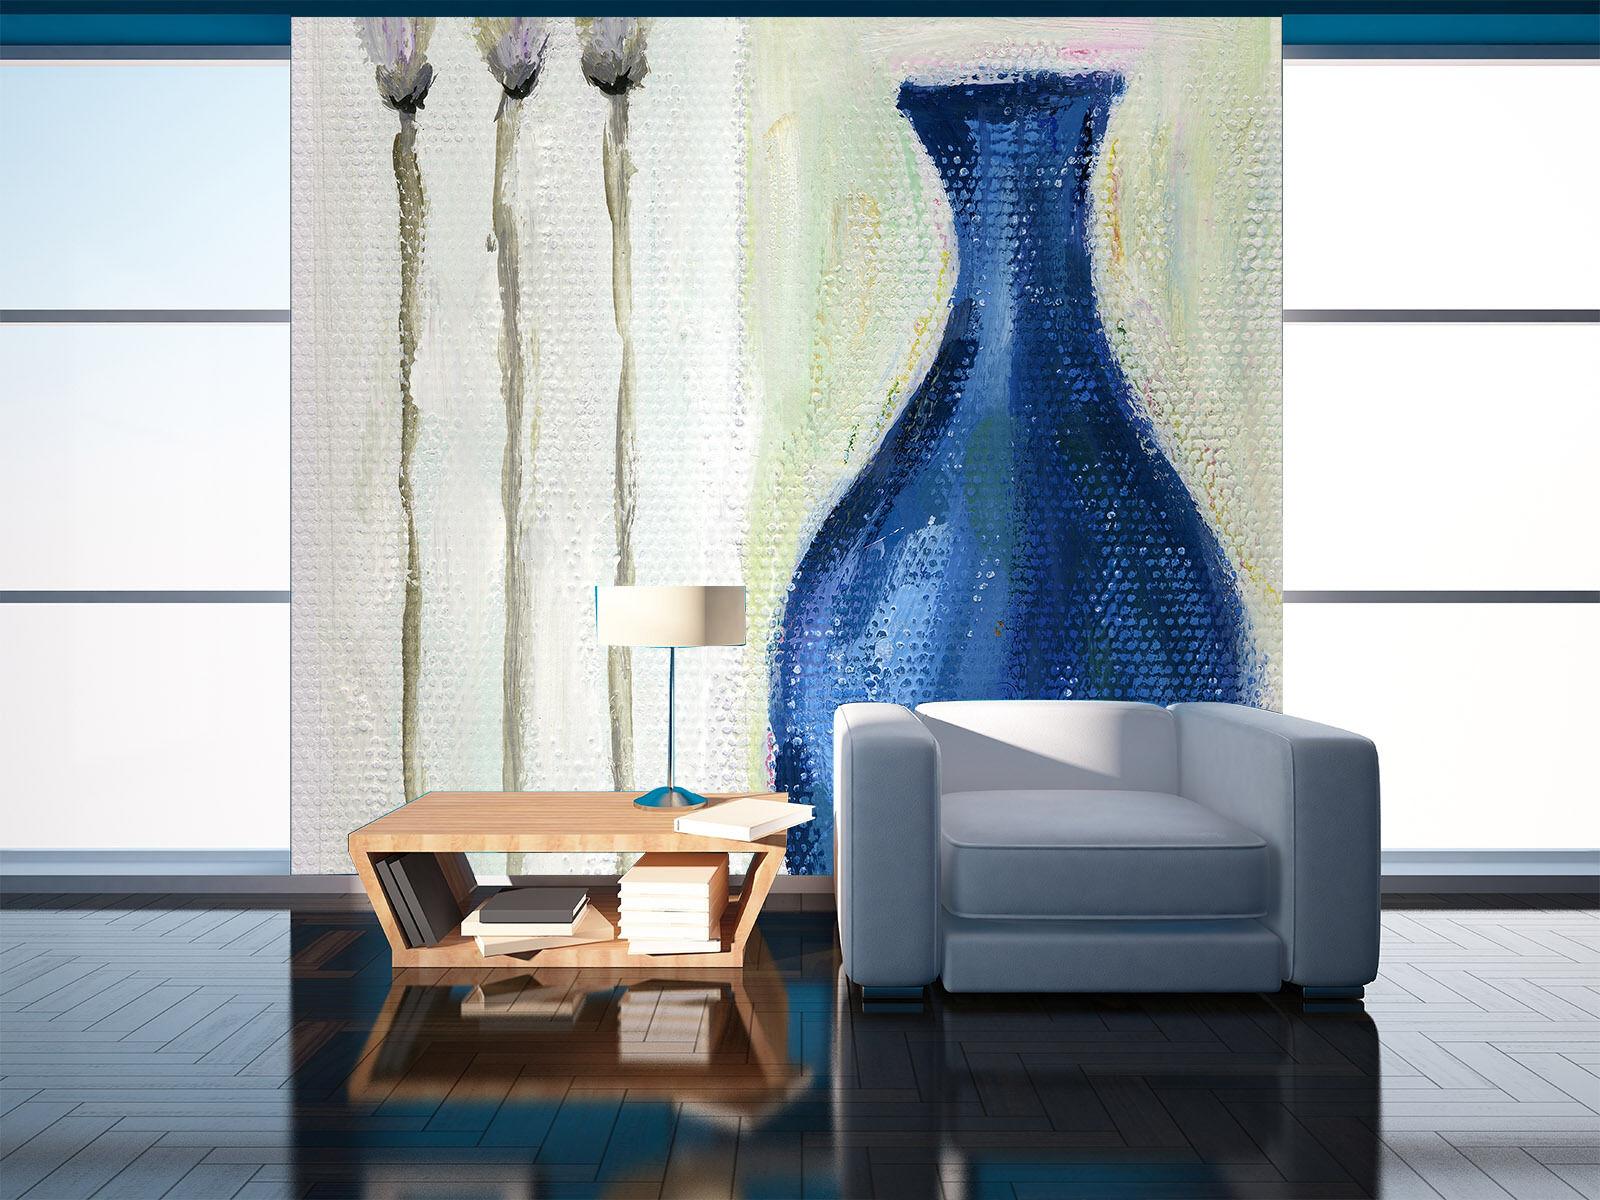 3D bluee Vase Paint 87 Wallpaper Mural Paper Wall Print Wallpaper Murals UK Lemon